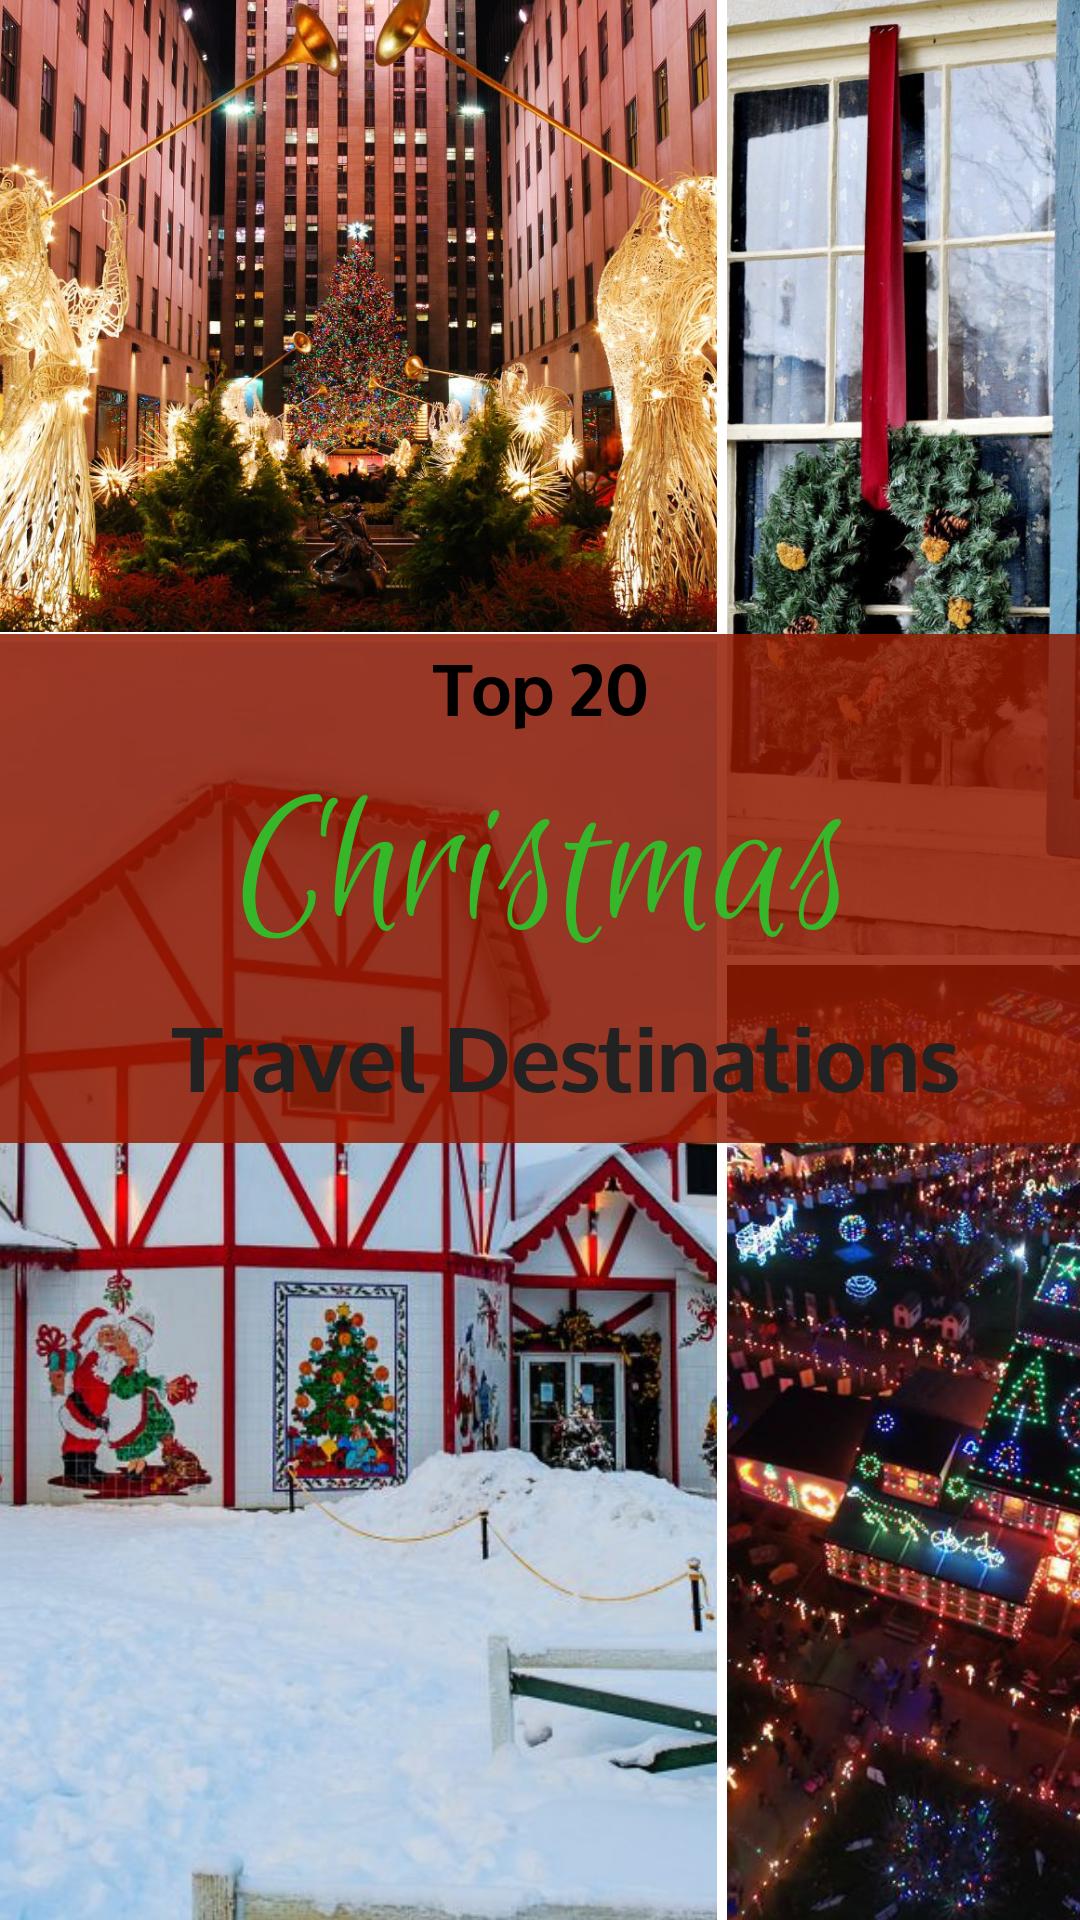 Top 20 Christmas Travel Destinations